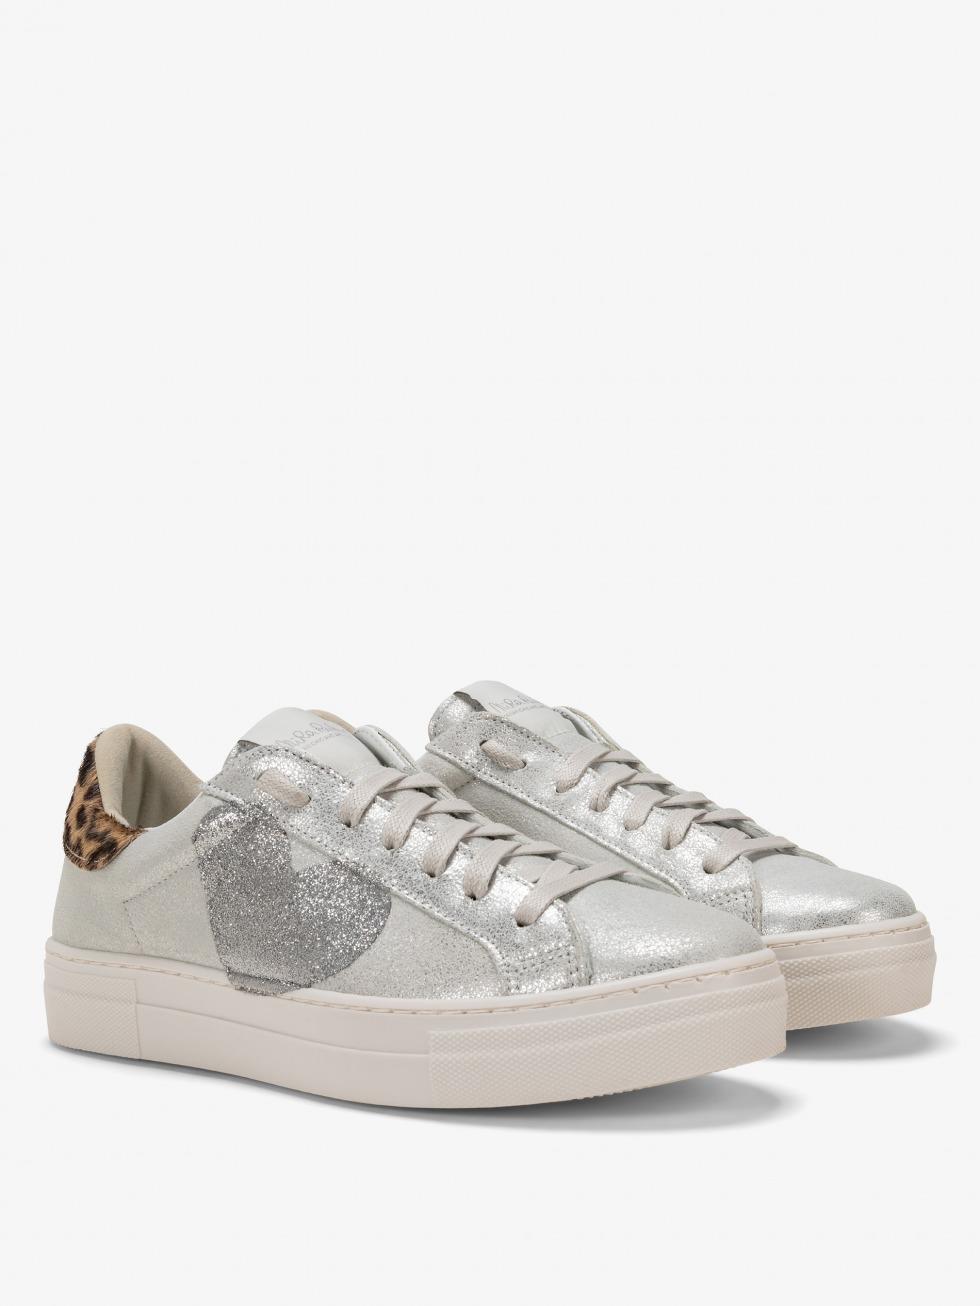 Martini Sneakers Vintage White - Heart